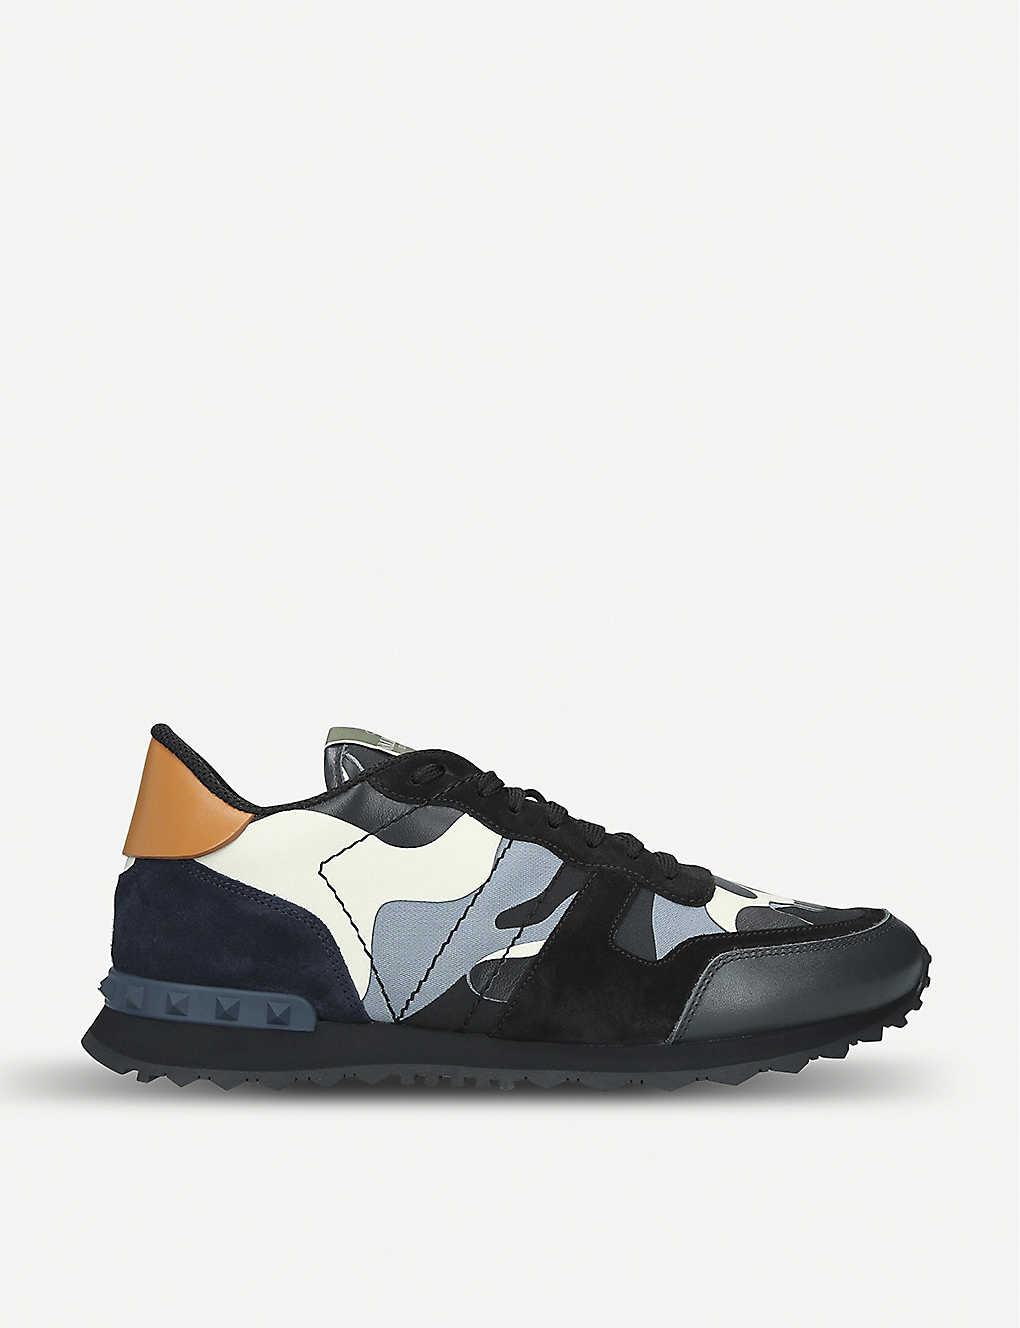 301475b76 VALENTINO - Camouflage studded-heel leather trainers | Selfridges.com